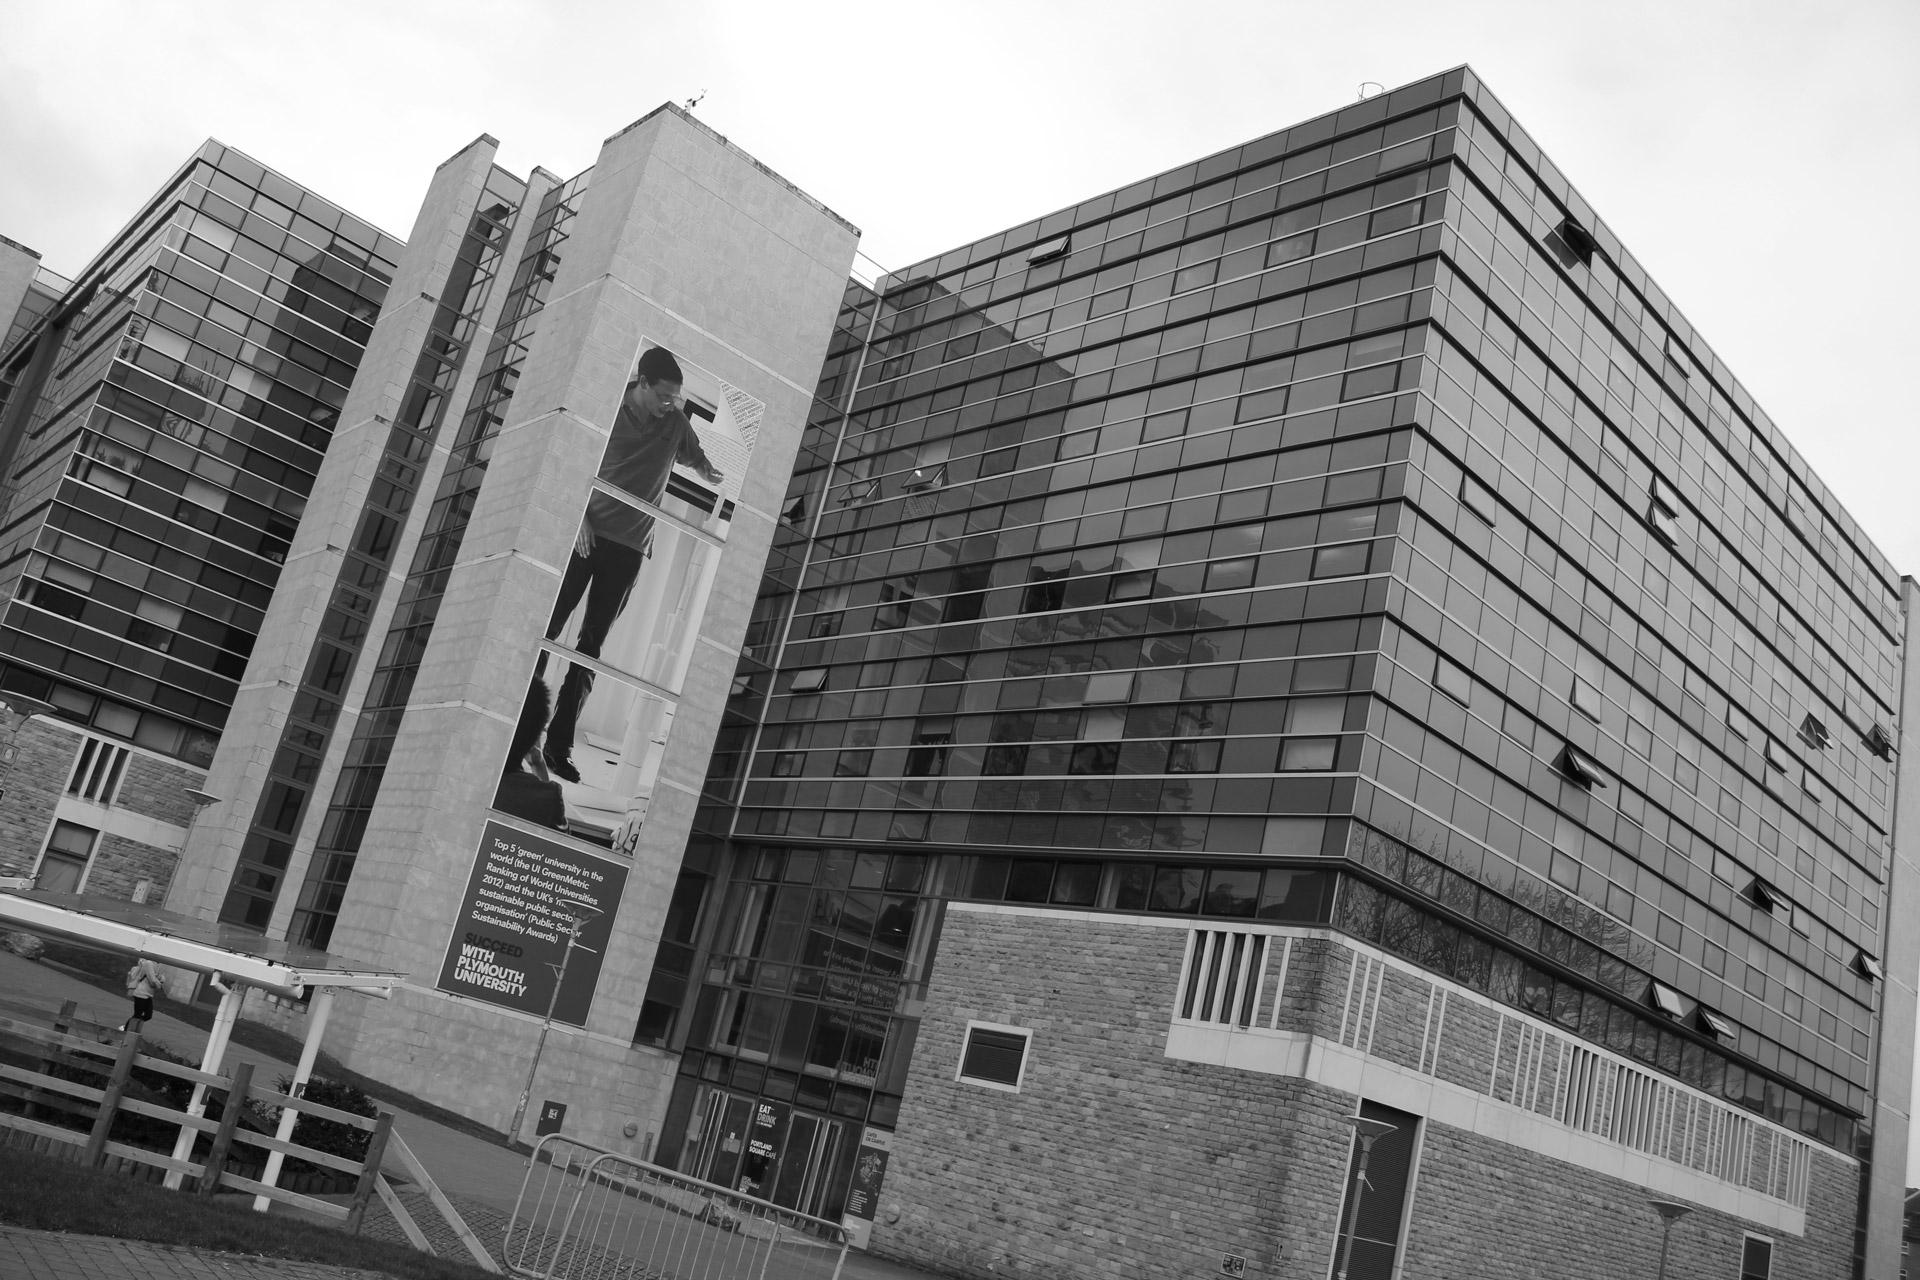 Portland Square Building - Plymouth University